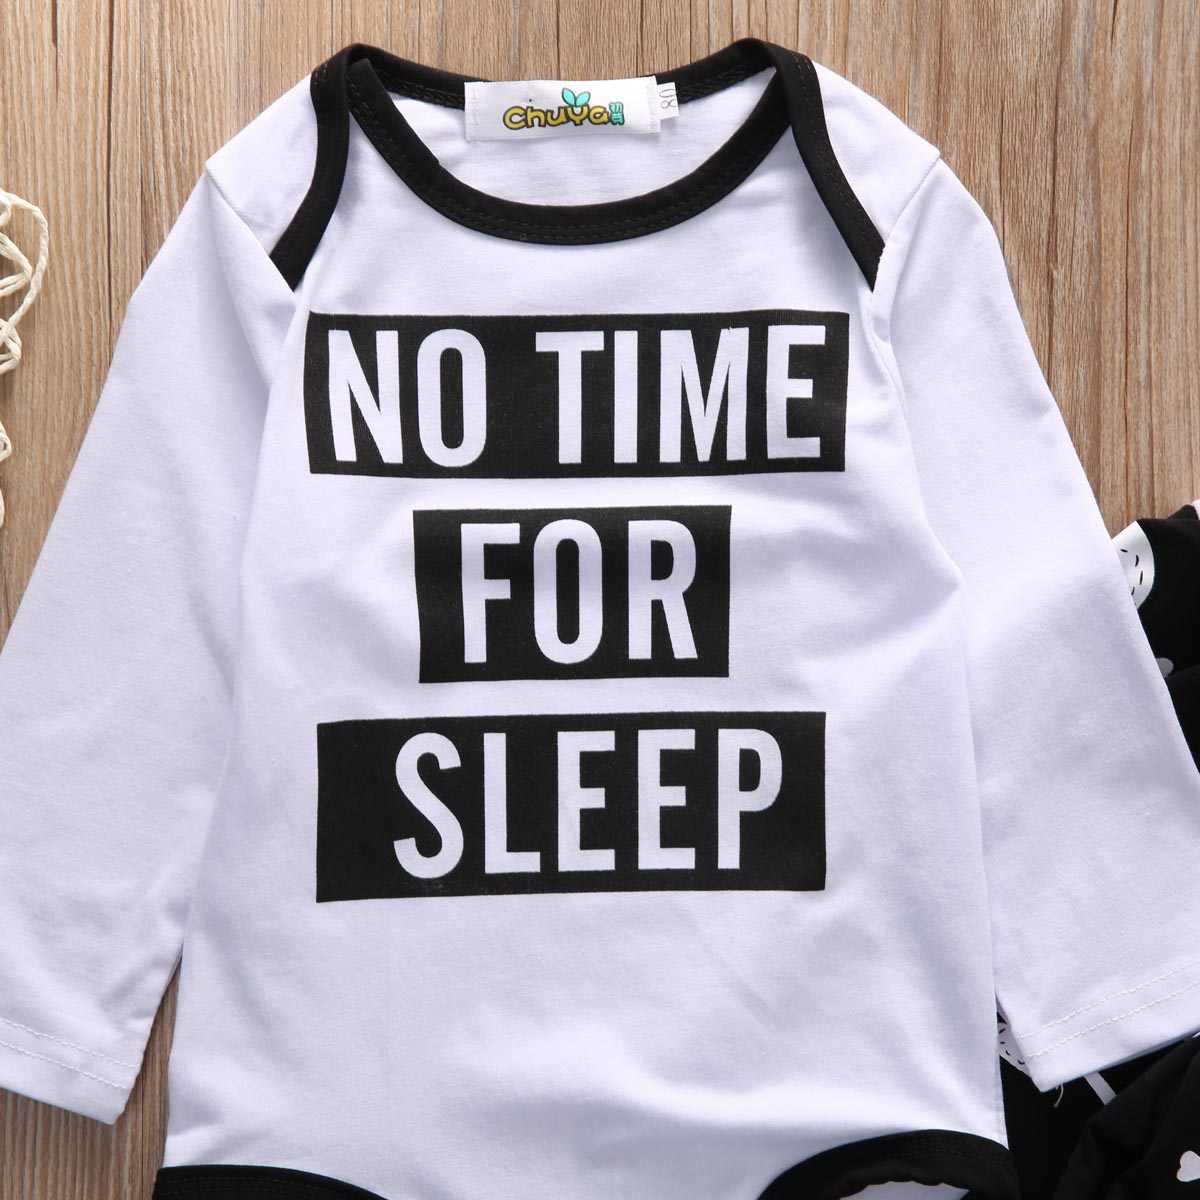 11d49bc4a ... 2 Pcs Babies Clothing Set Newborn Baby Kids Girl Boy Outfit Infant New  Kid Bodysuit Onesie ...